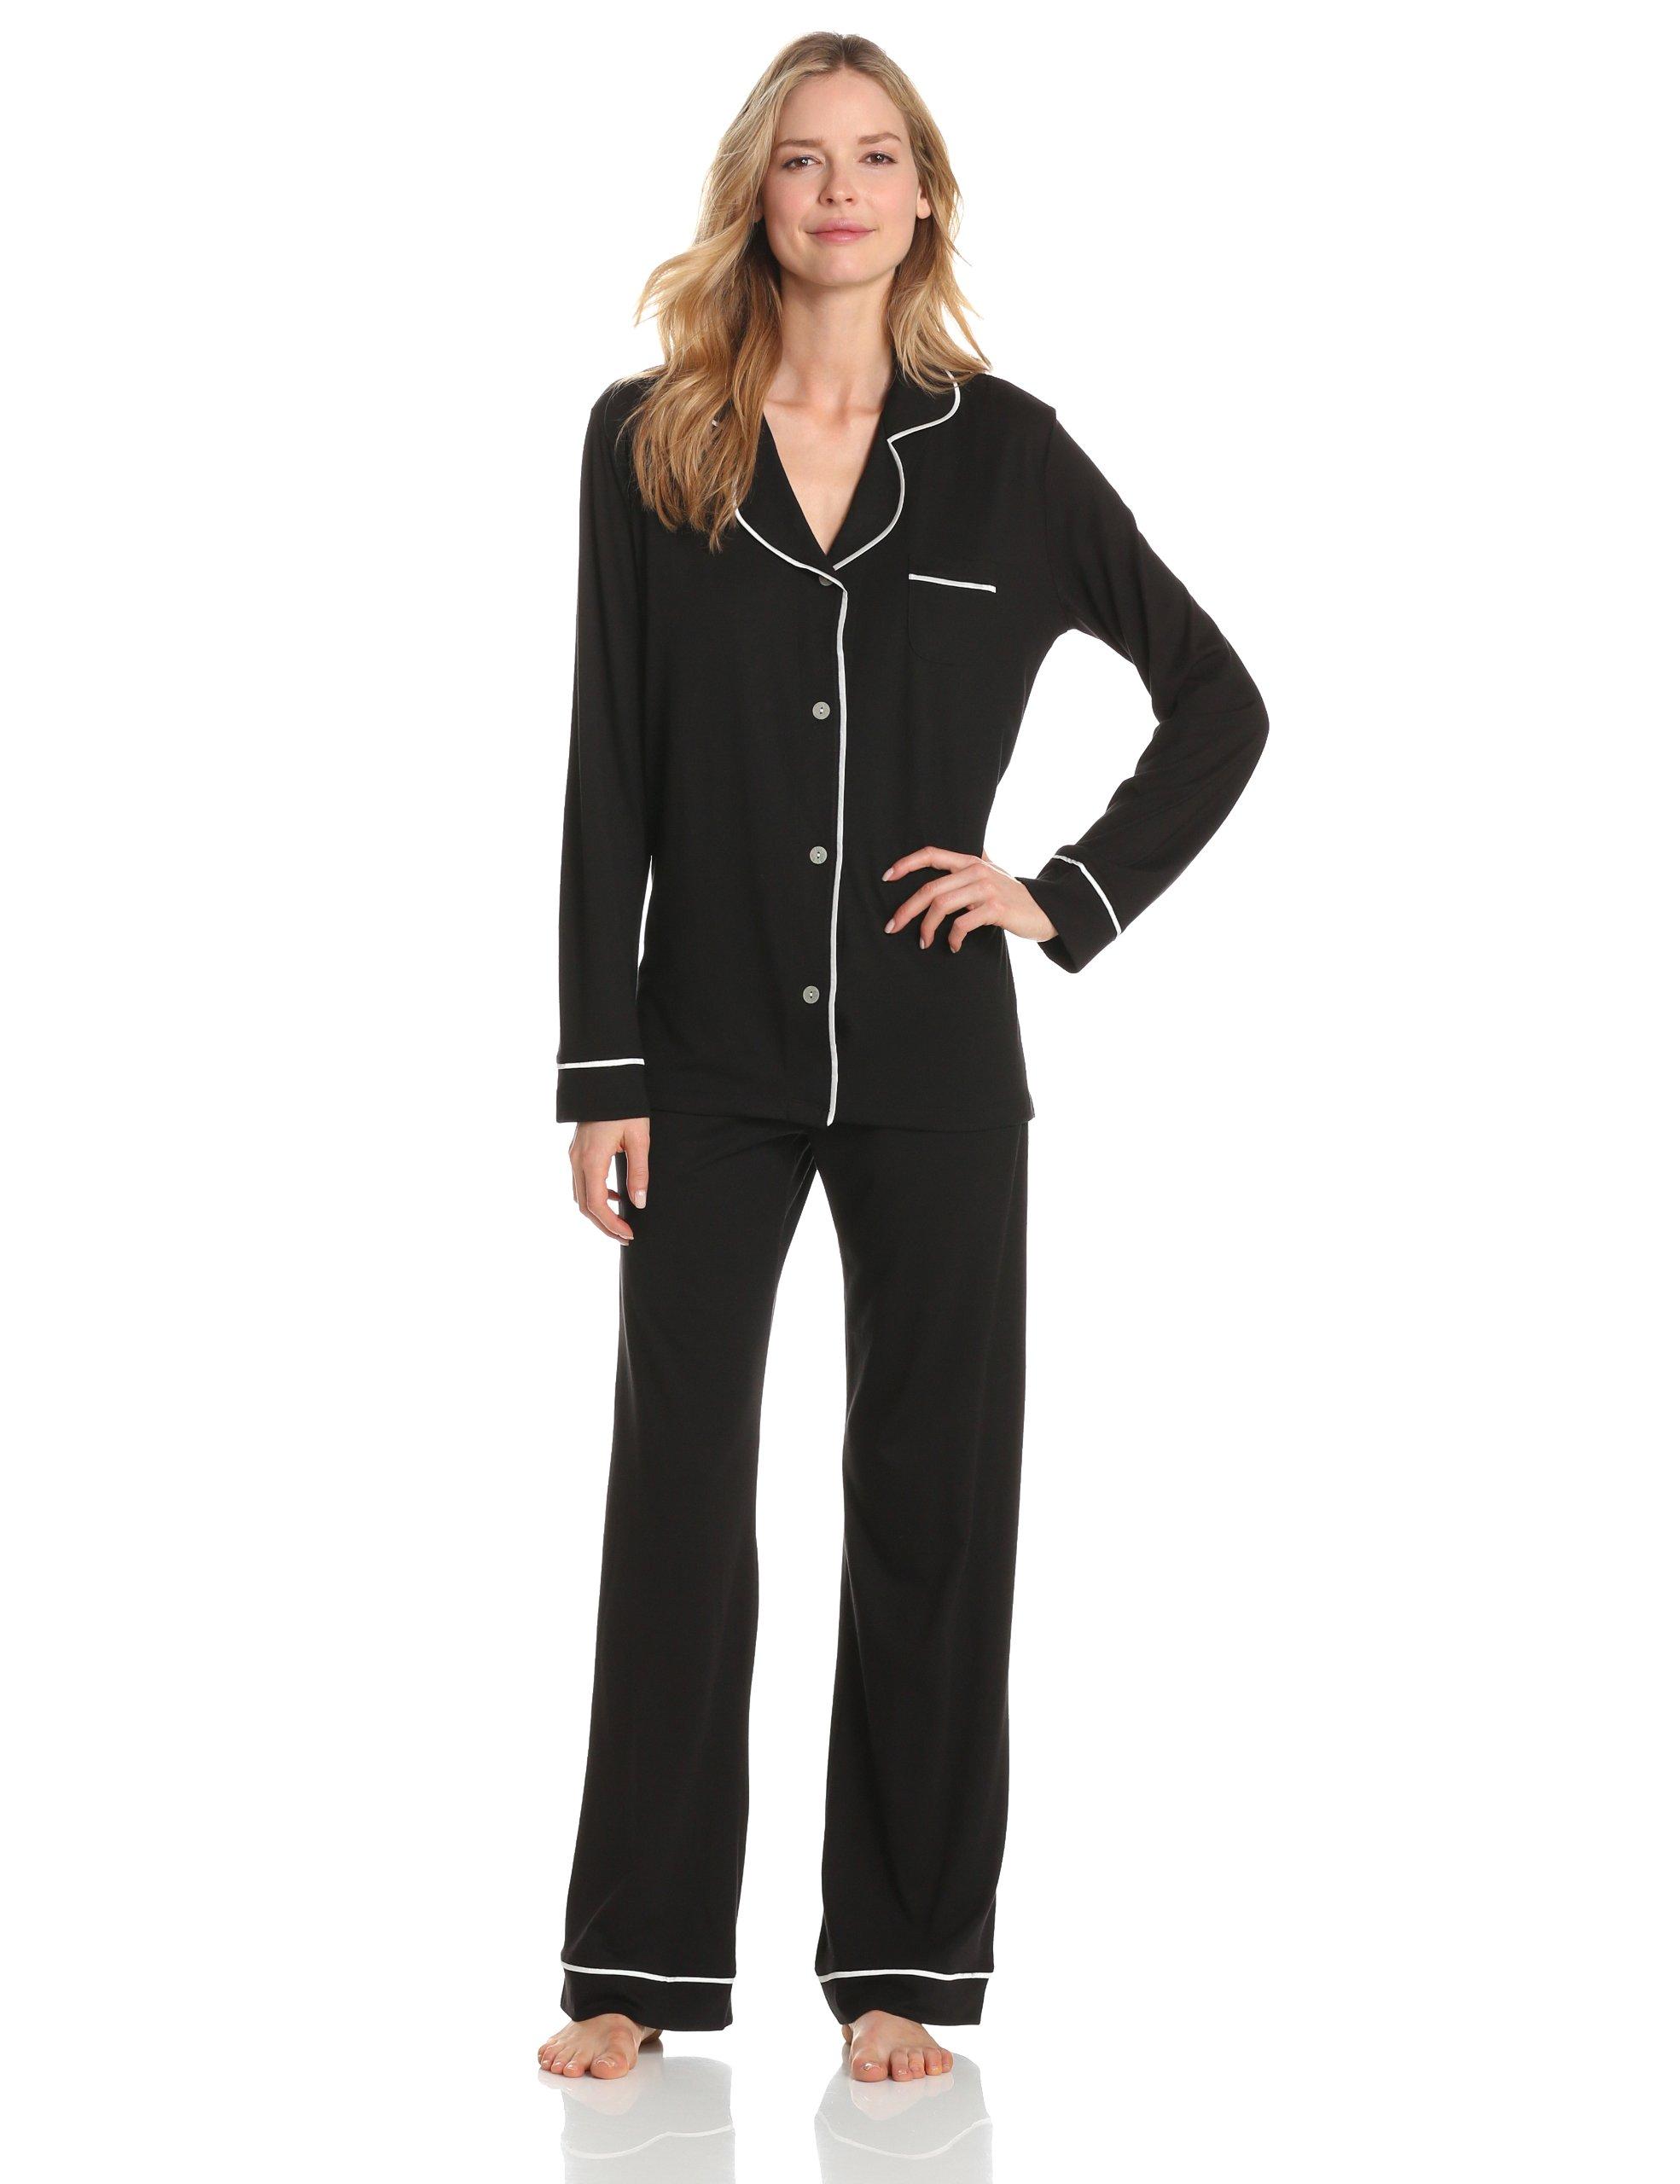 Cosabella Women's Amore Pajama Set, Black/Ivory, Medium